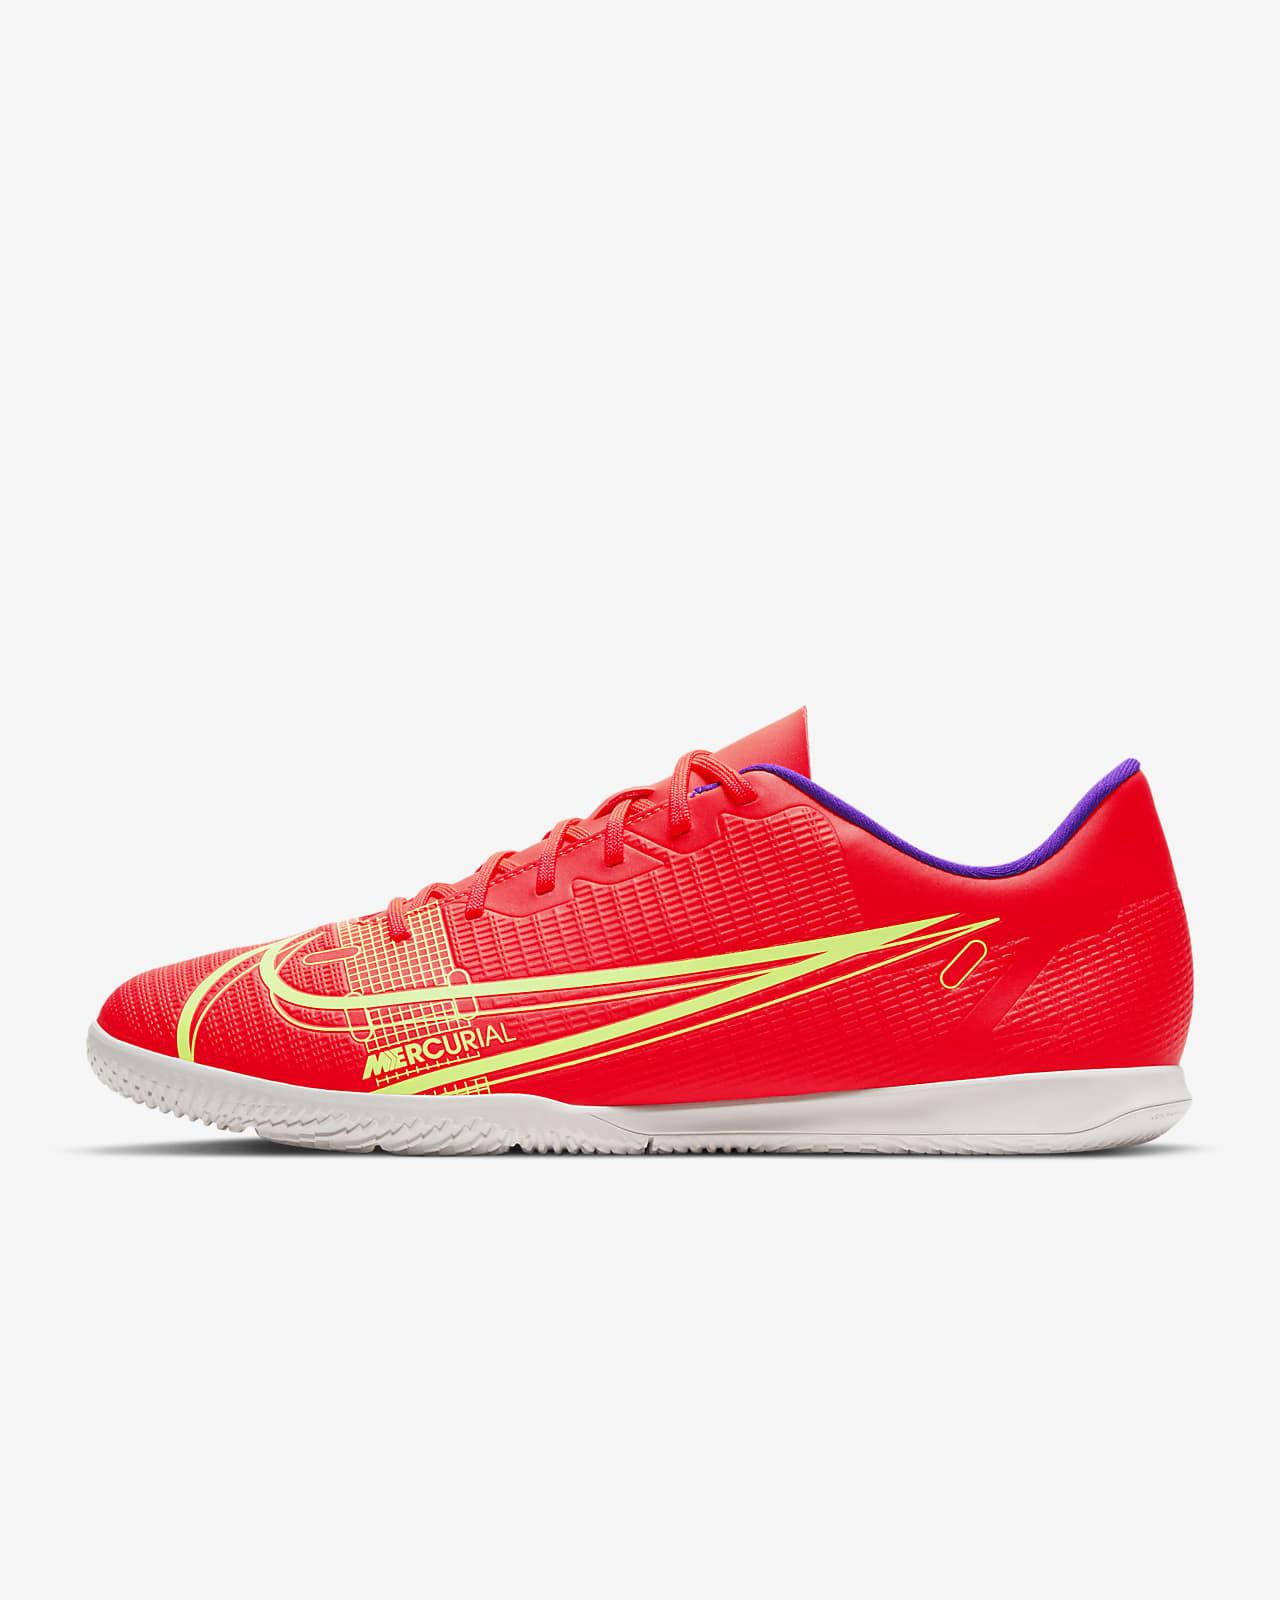 Halowe Buty Pilkarskie Nike Mercurial Vapor 14 Club Ic Nike Pl